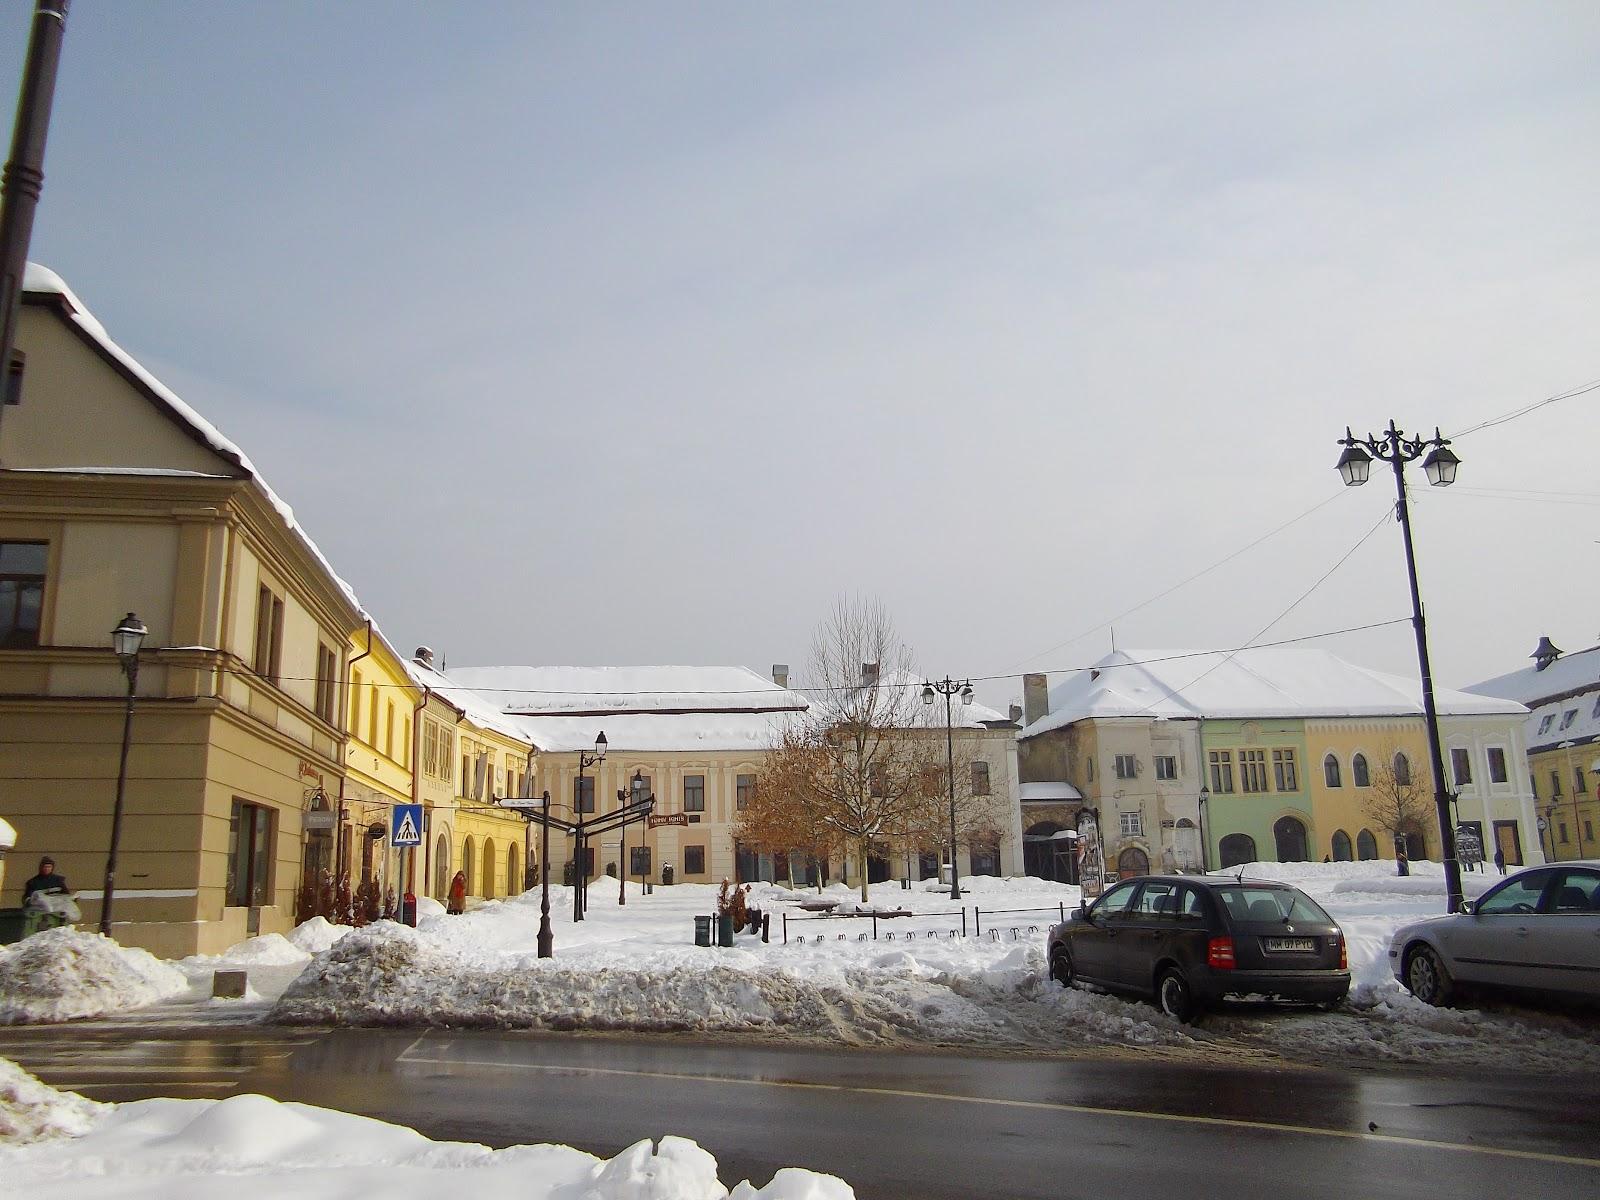 Centrul istoric din Baia Mare - Wikipedia  |Baia Mare